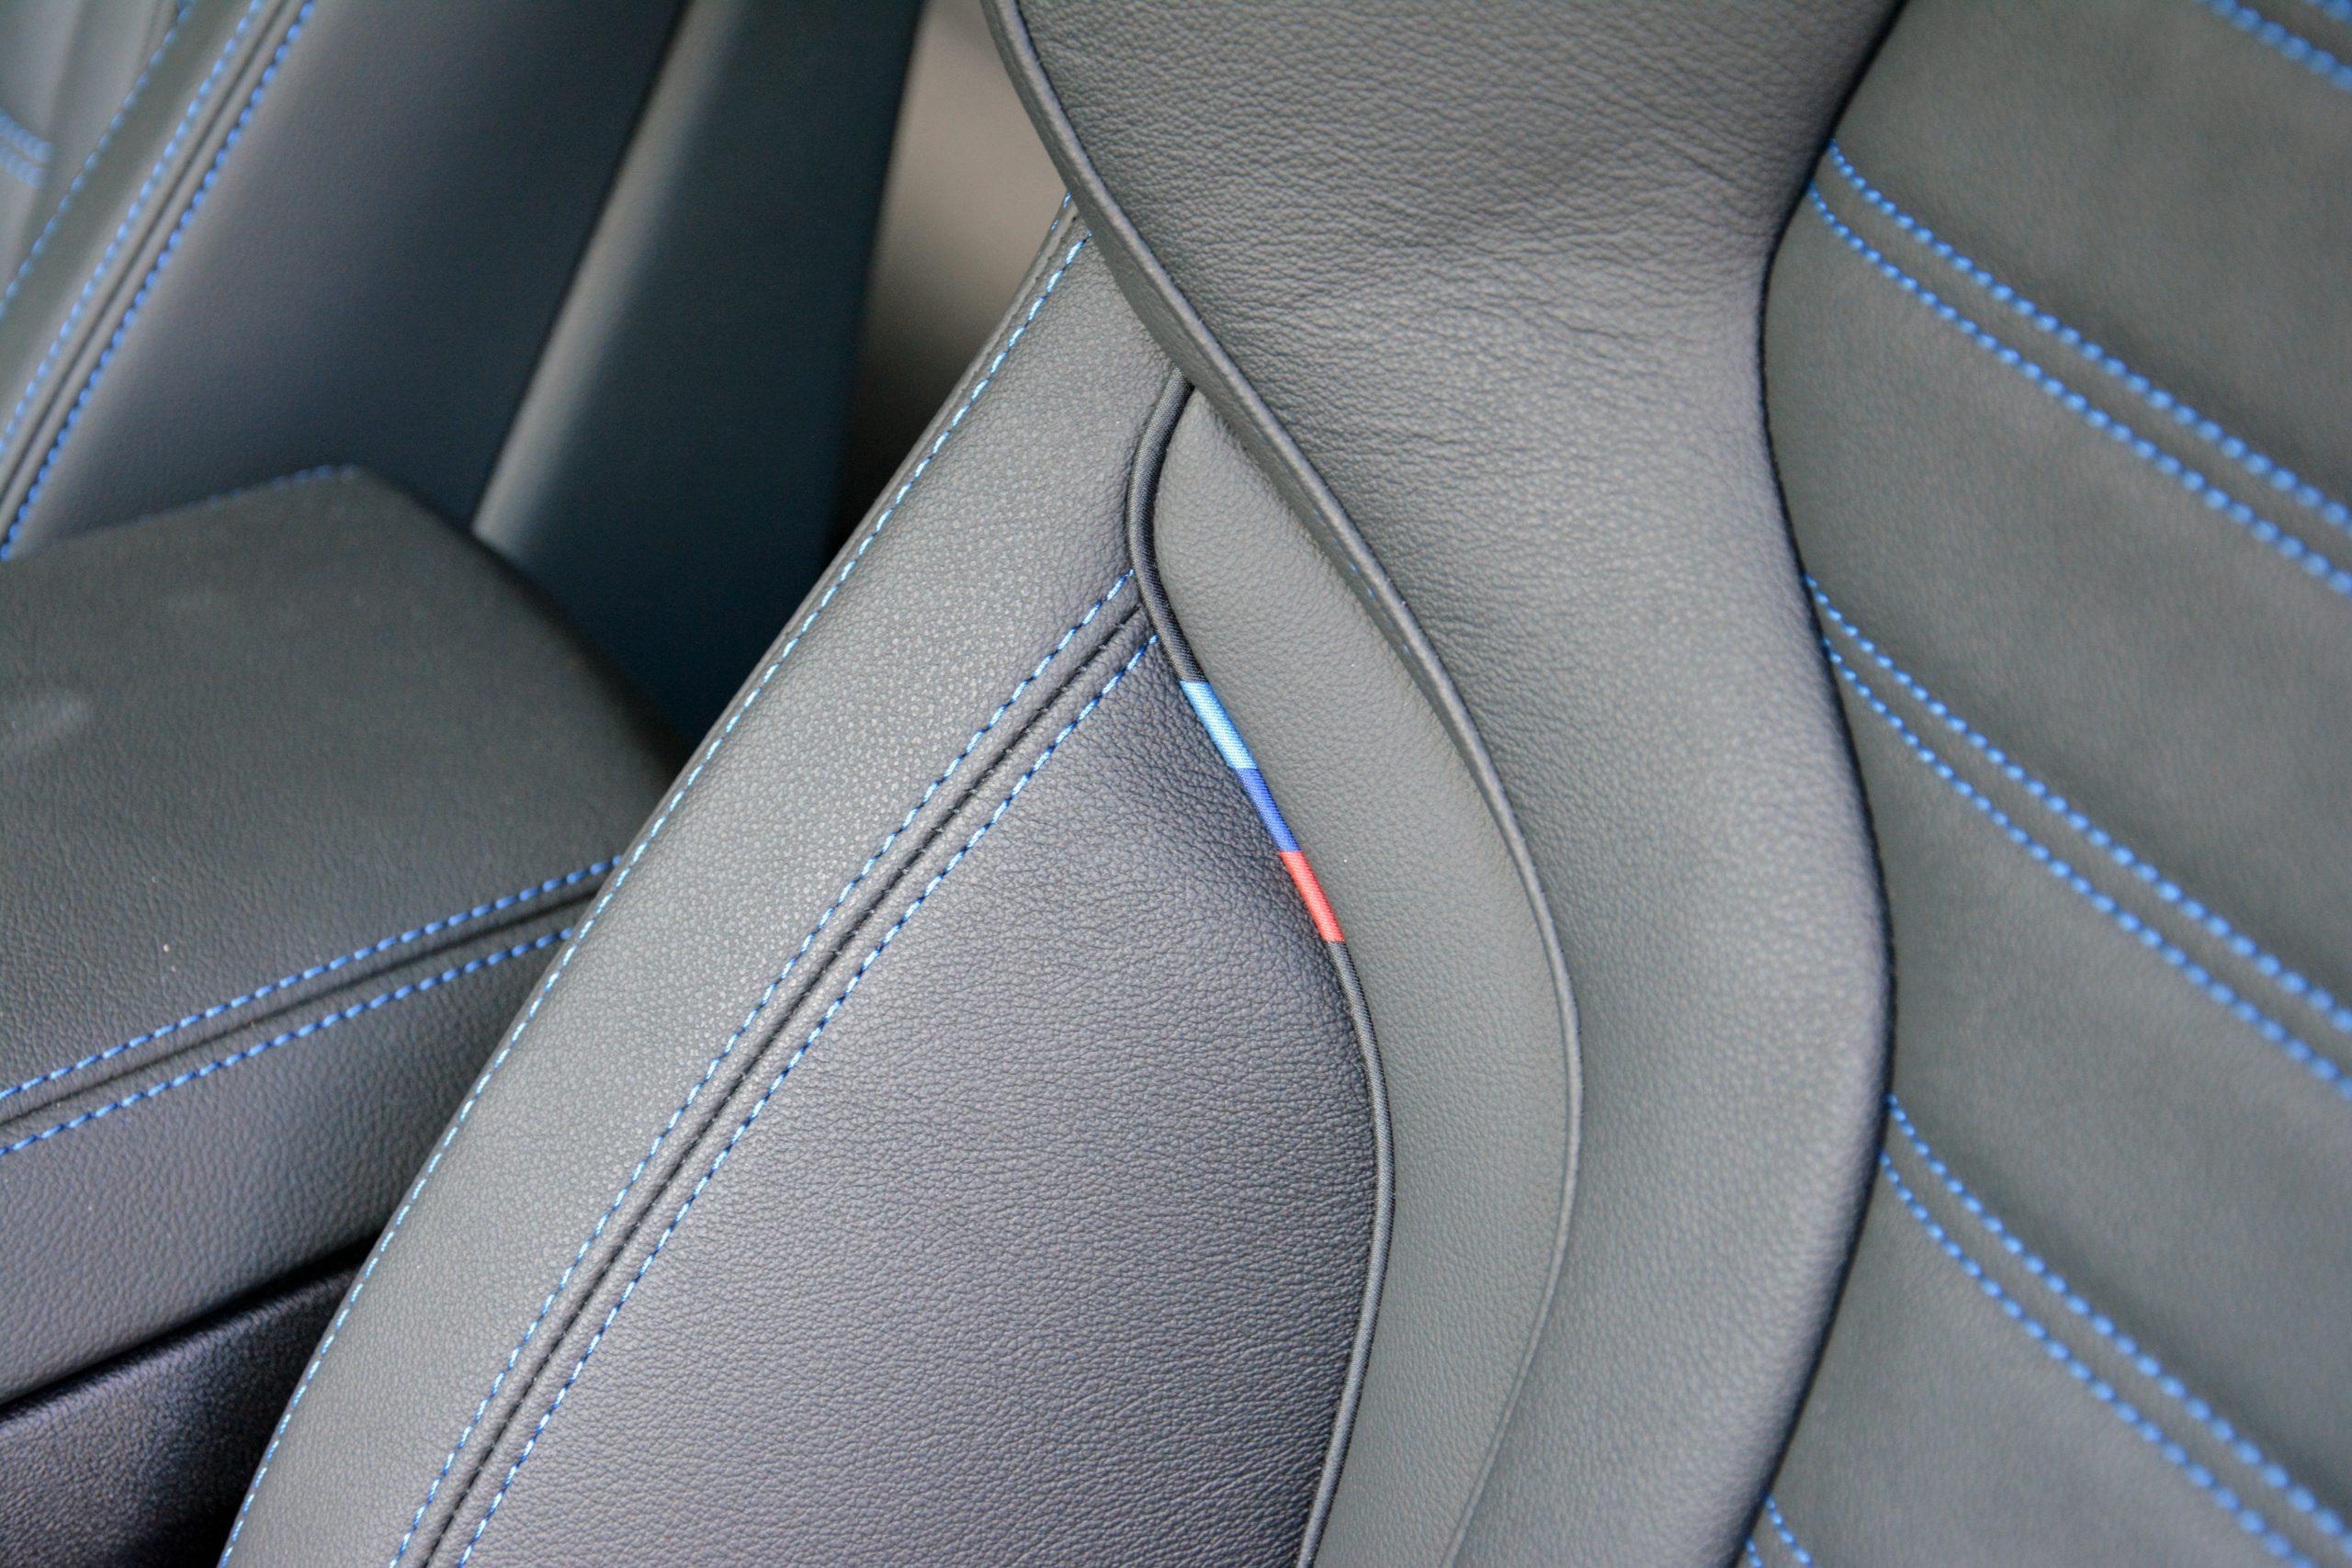 2022 BMW i4 M50 interior leather seat stitching detail